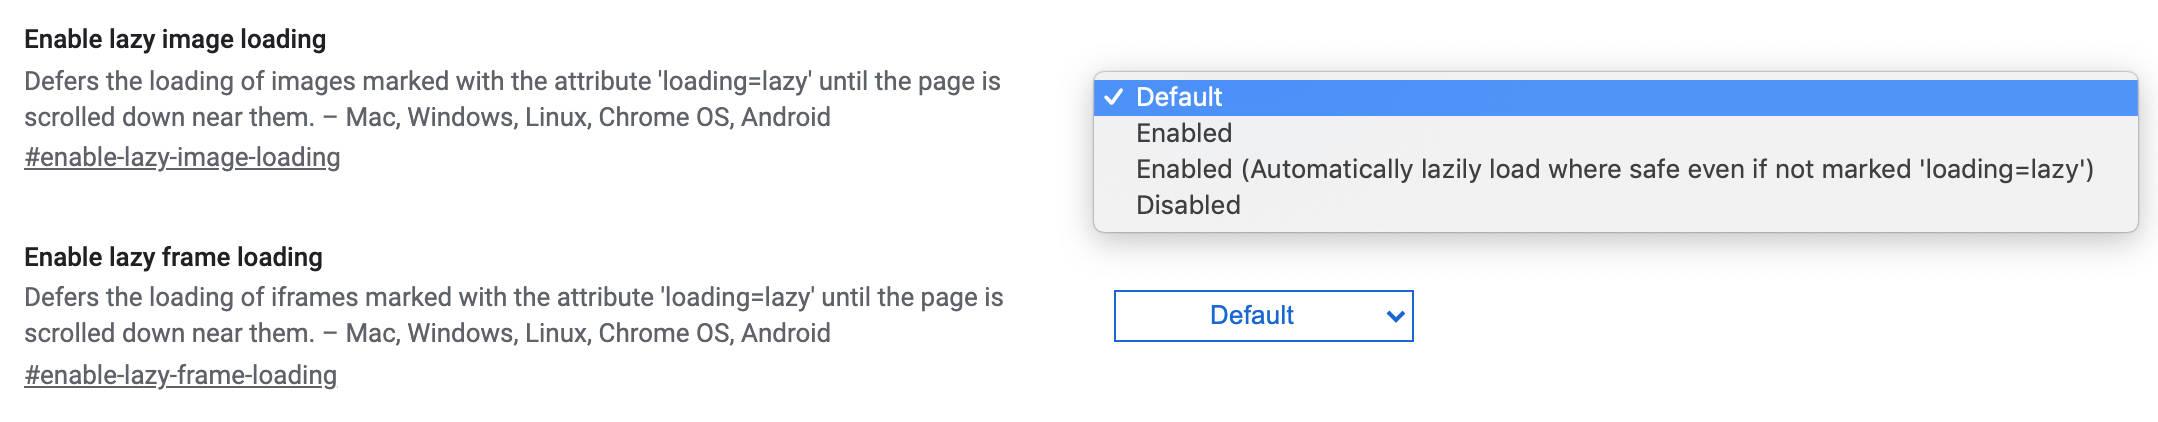 Lazy loading settings in Chrome